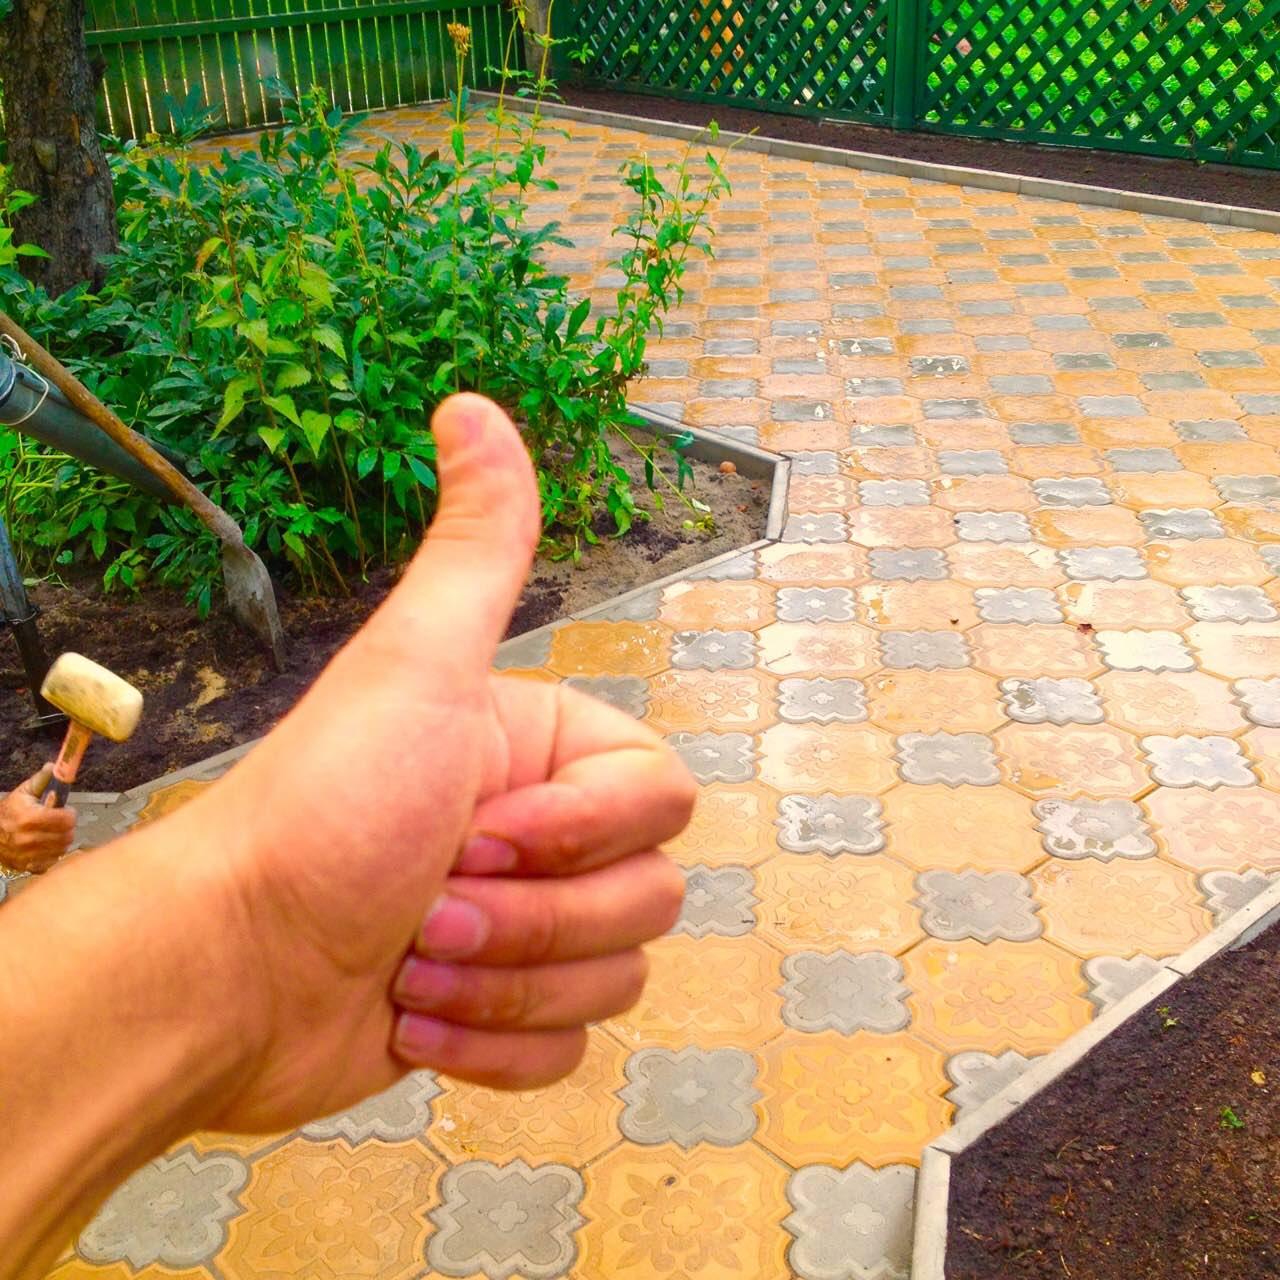 Фото укладки тротуарной плитки своими руками